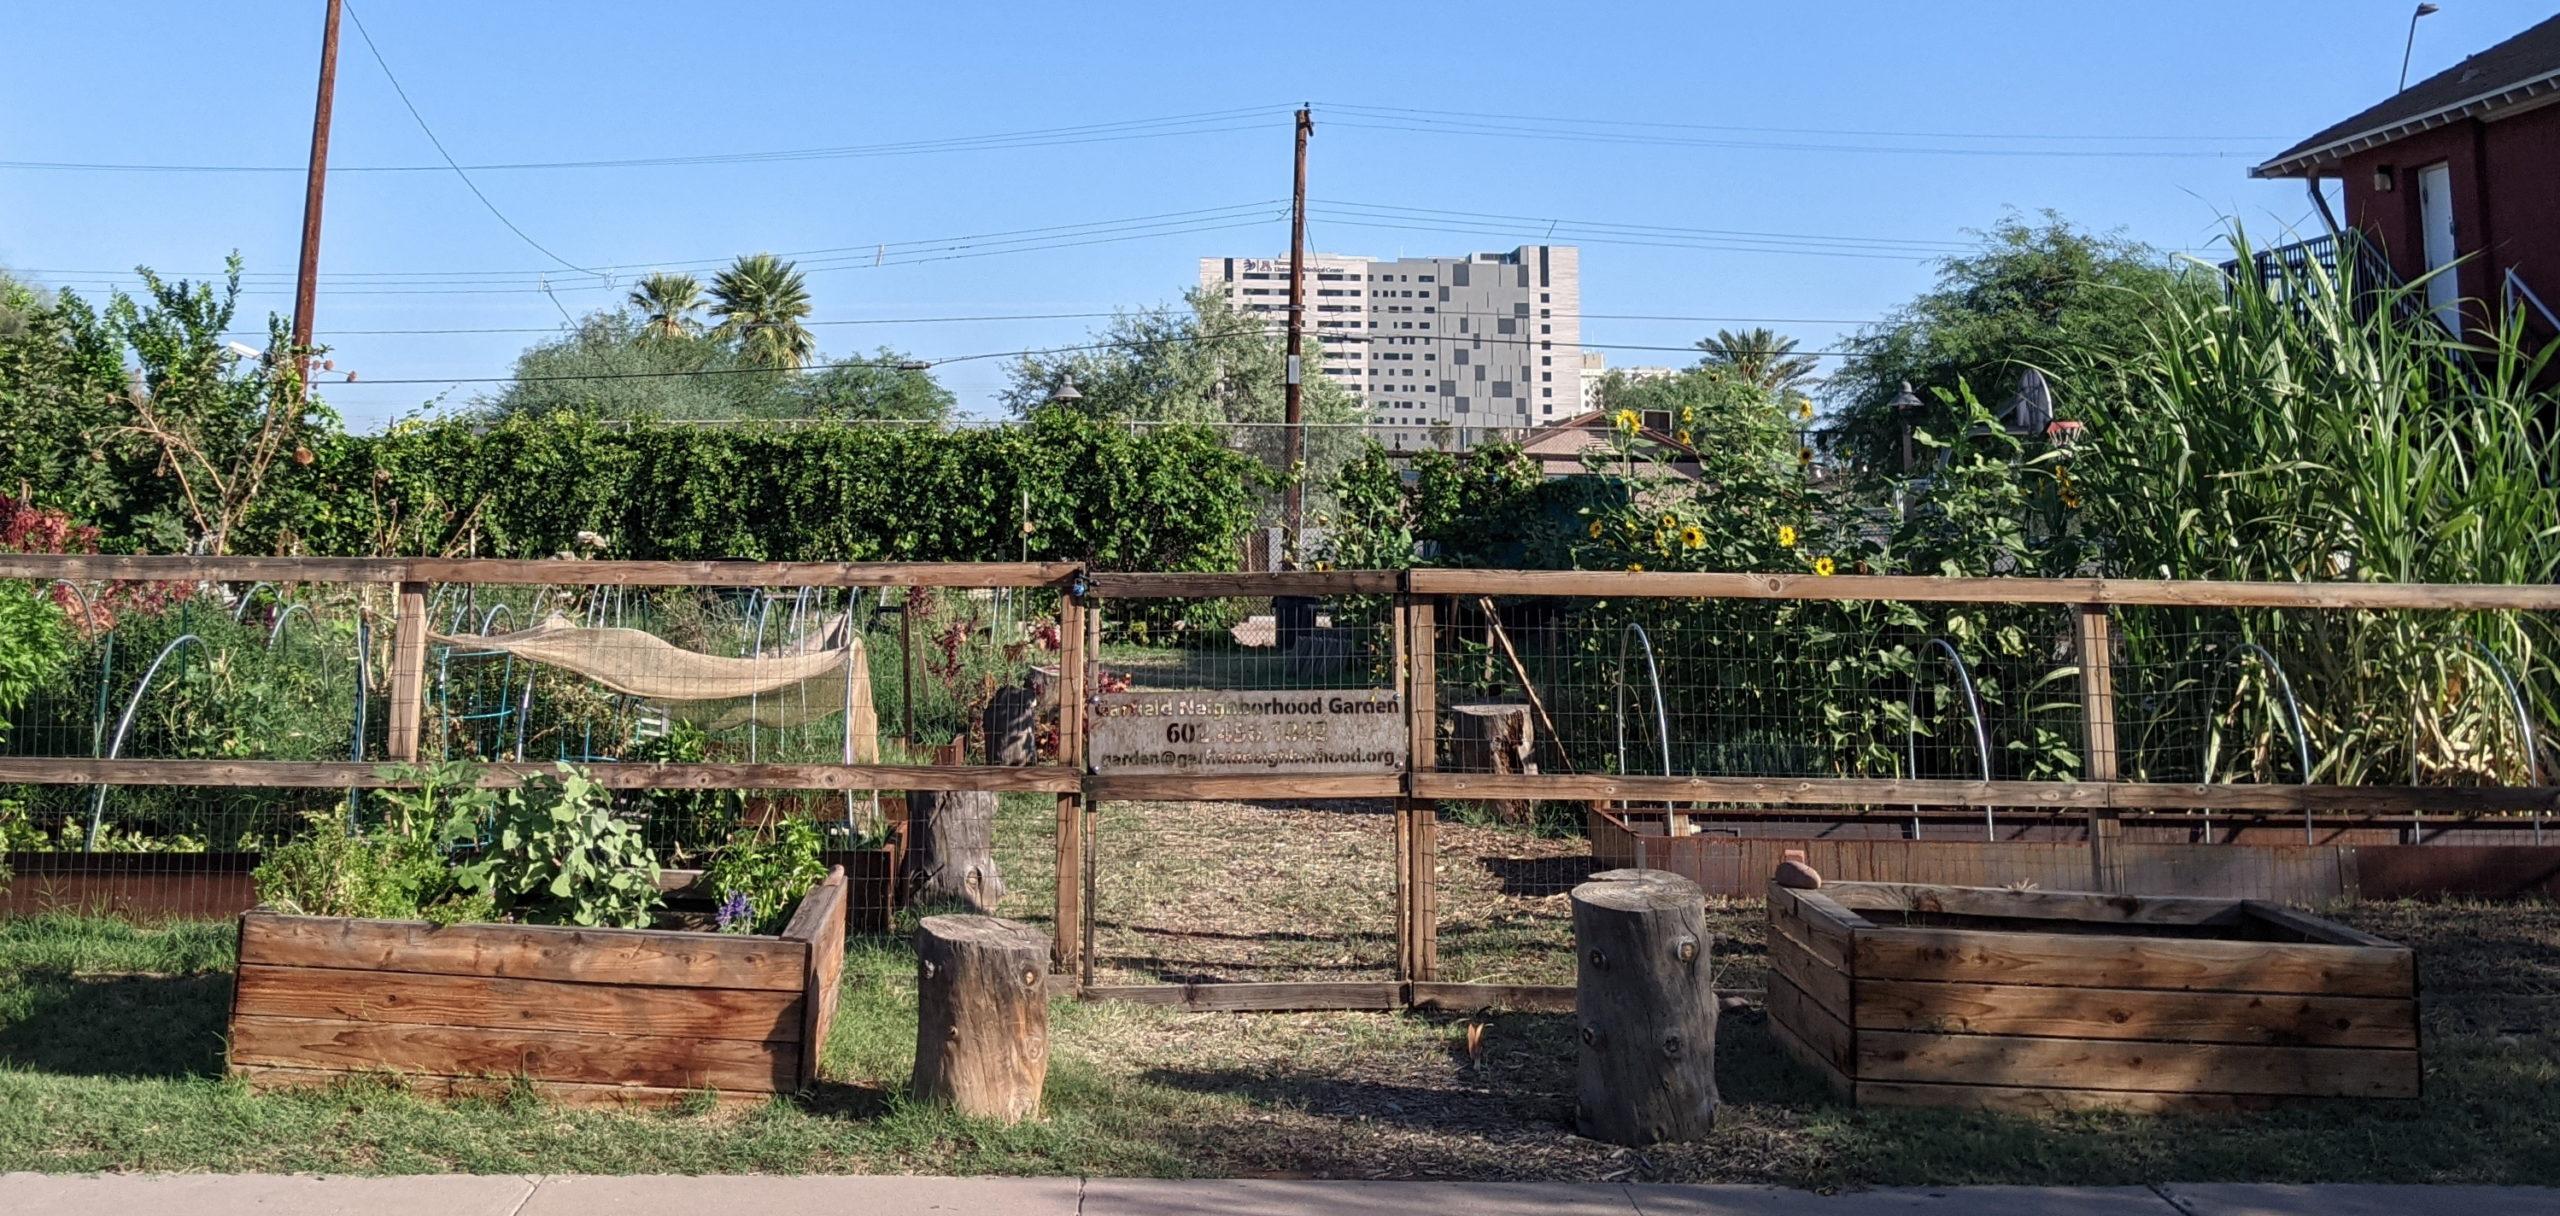 Garfield Neighborhood Garden